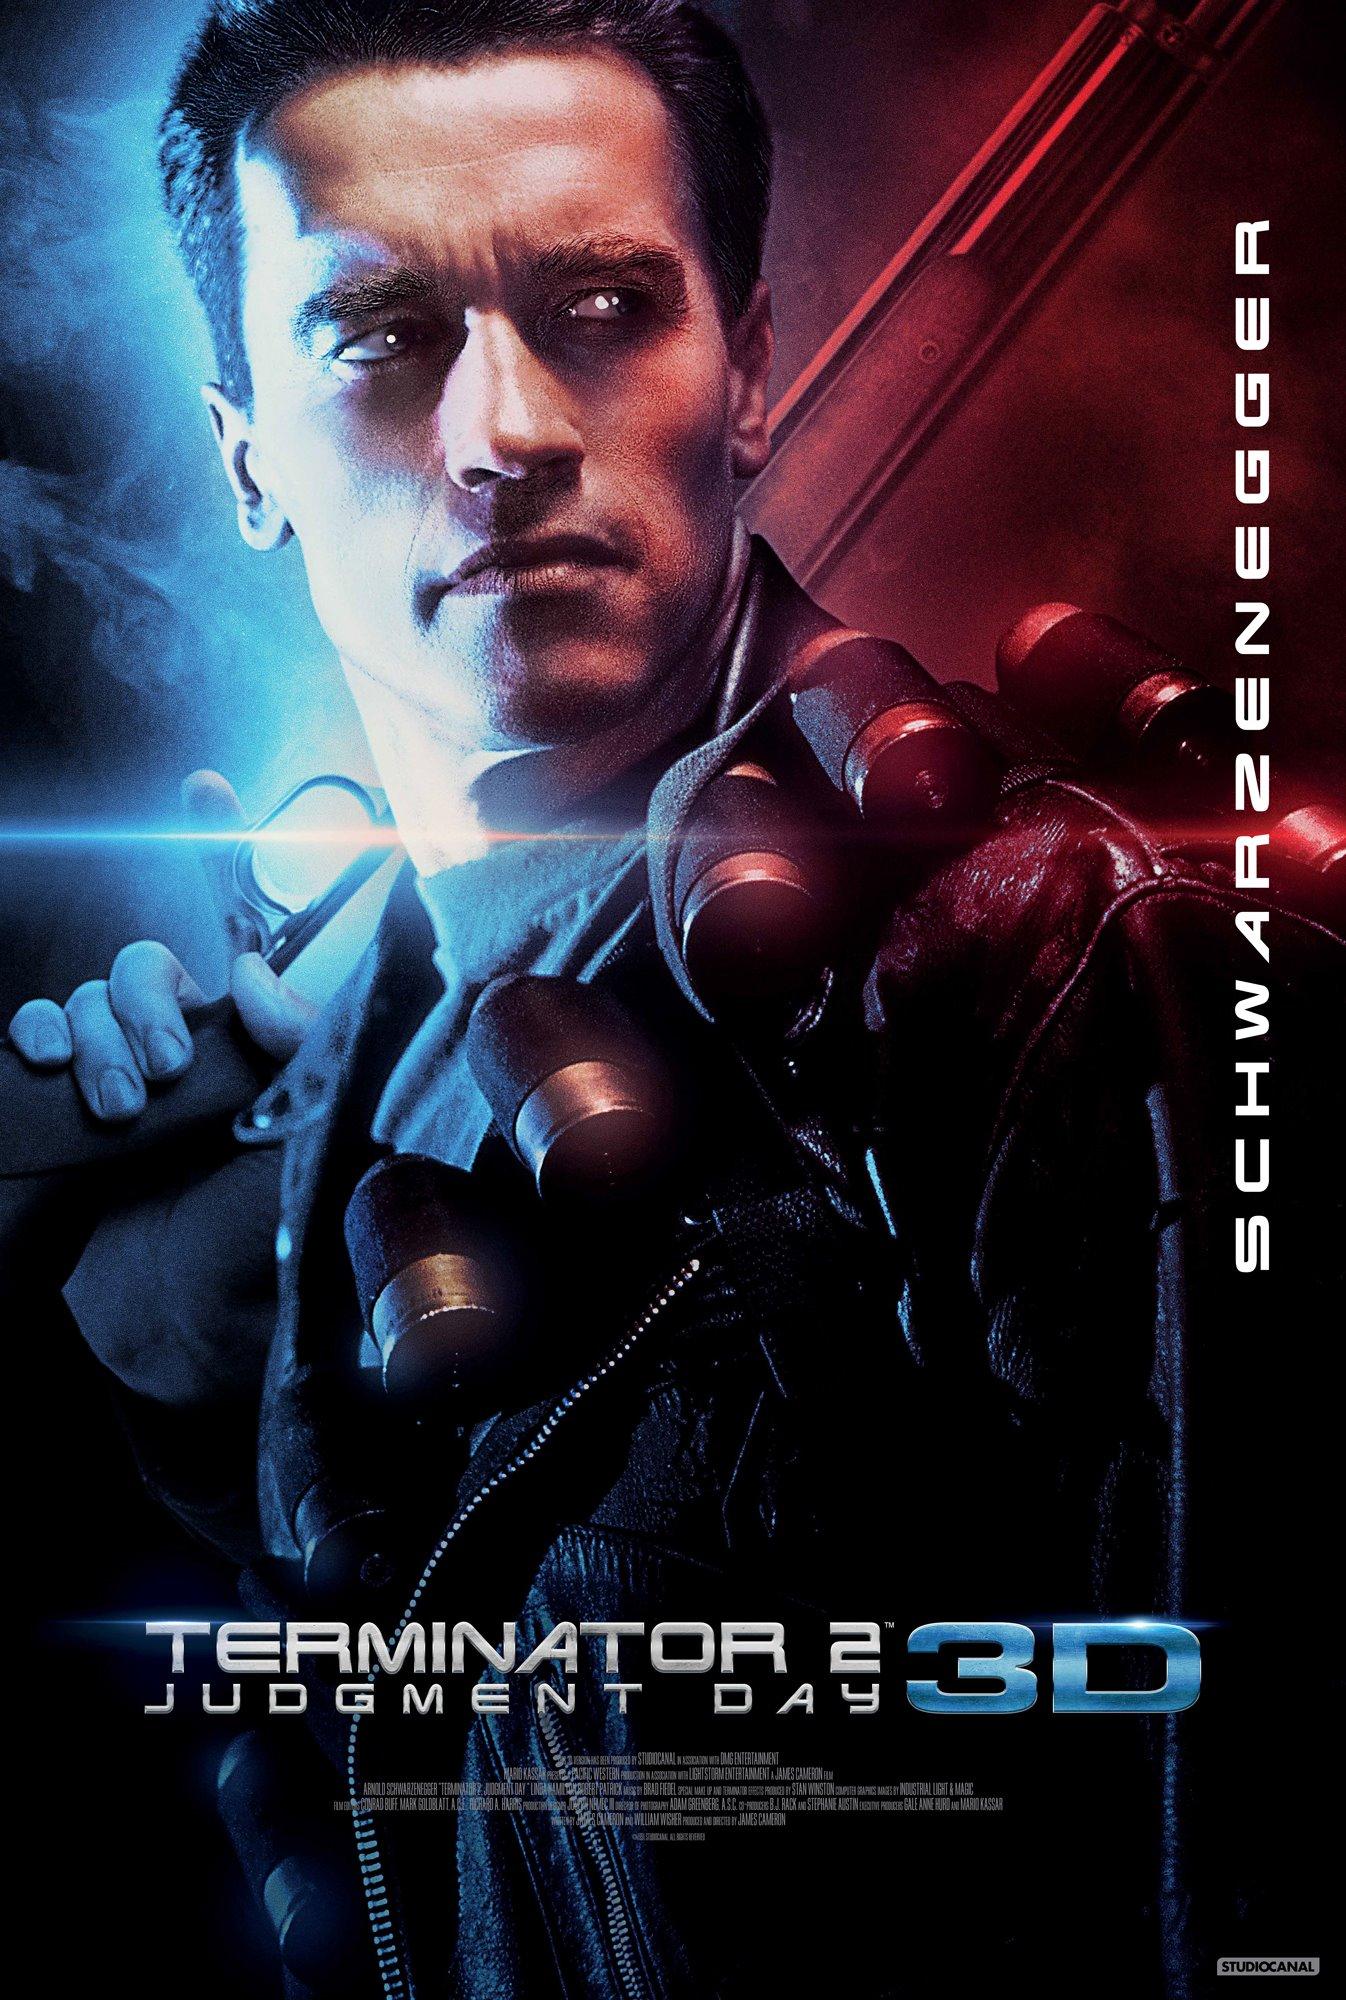 Primer póster de Terminator 2: Judgment Day 3D.